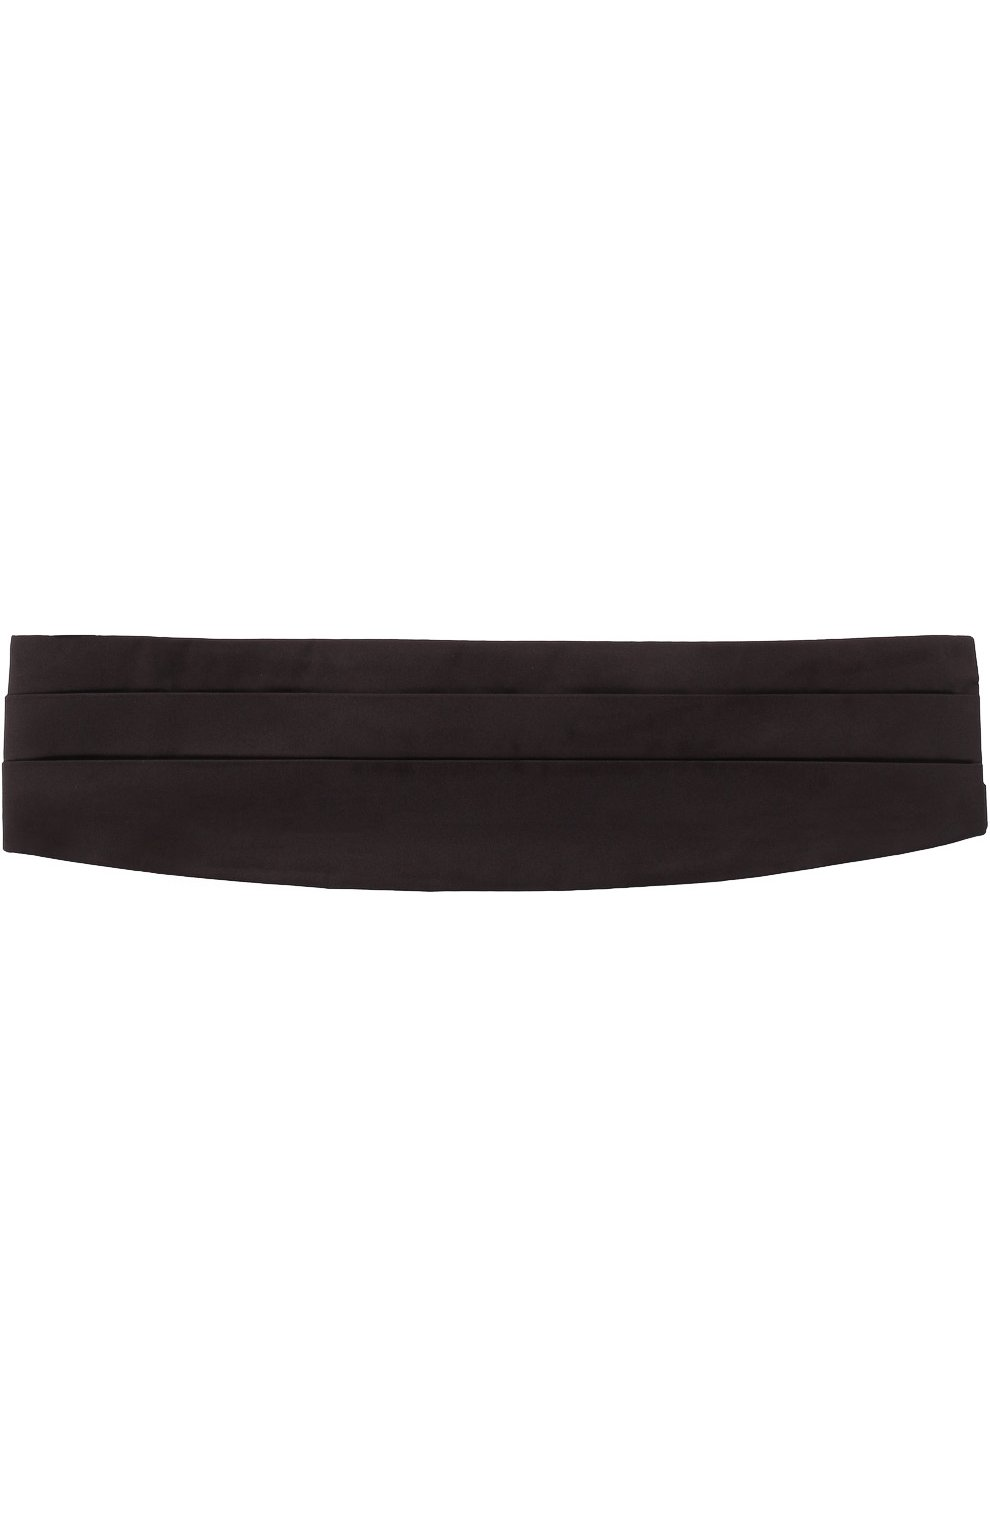 Мужской шелковый камербанд GIORGIO ARMANI черного цвета, арт. 360033/7P998 | Фото 1